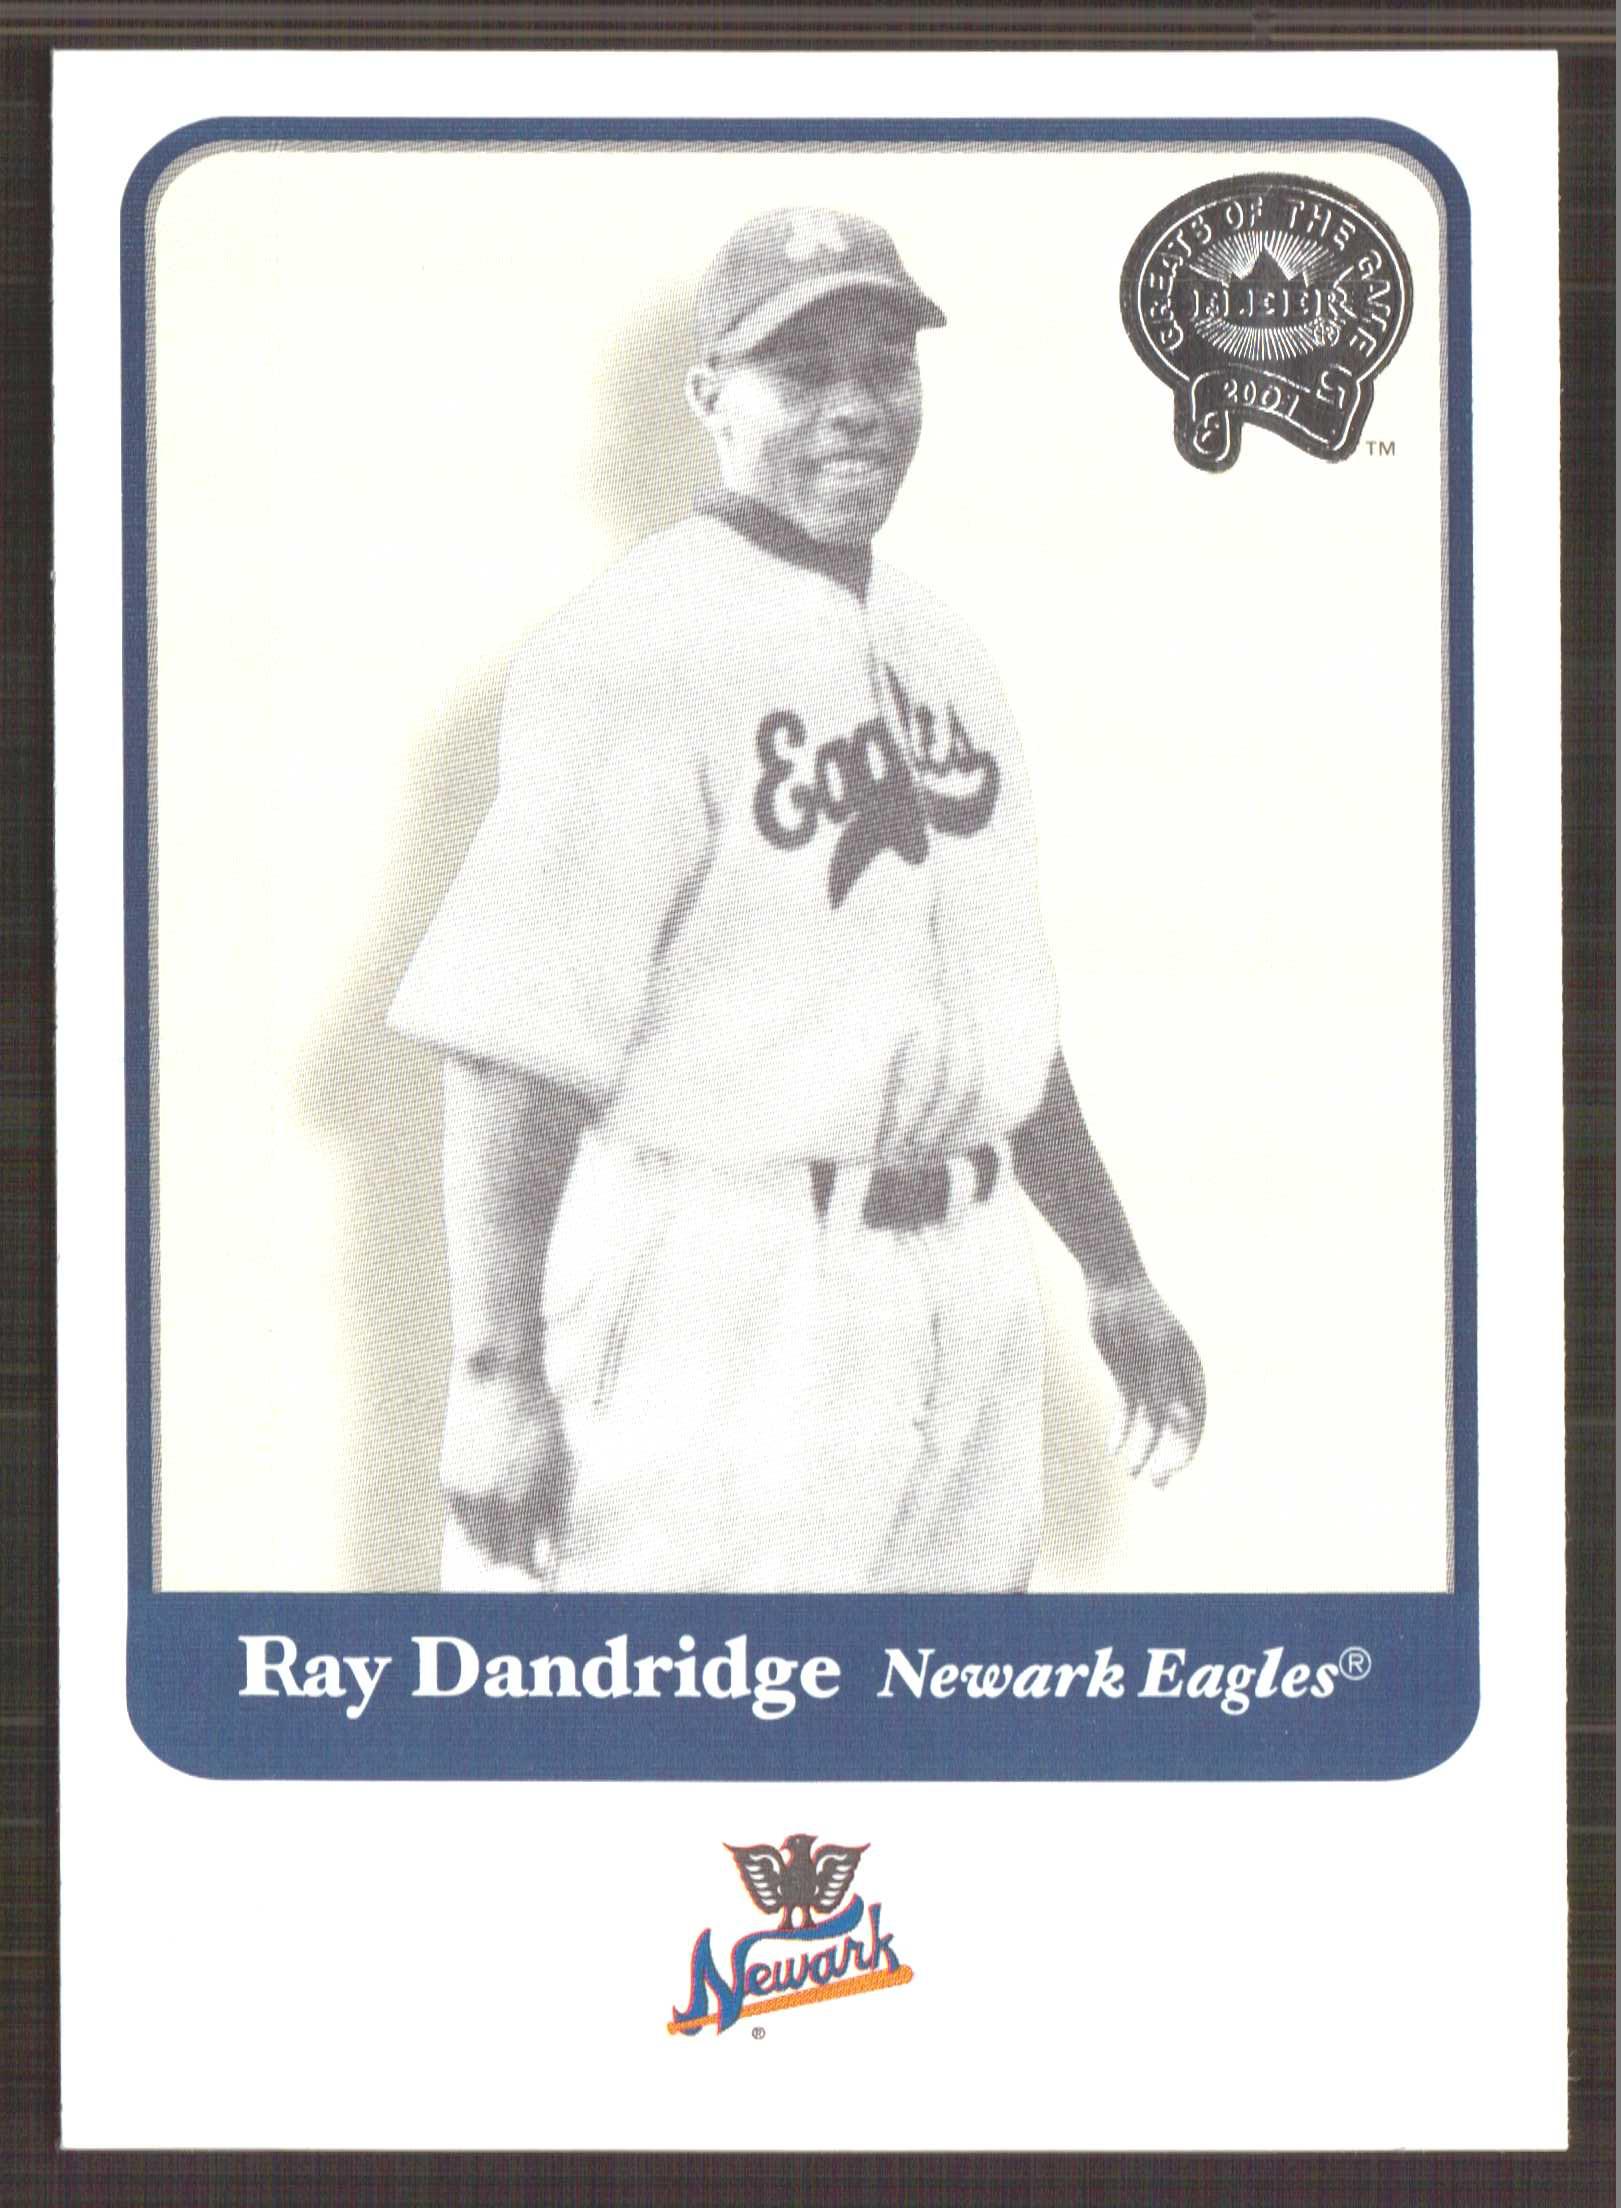 2001 Greats of the Game #51 Ray Dandridge